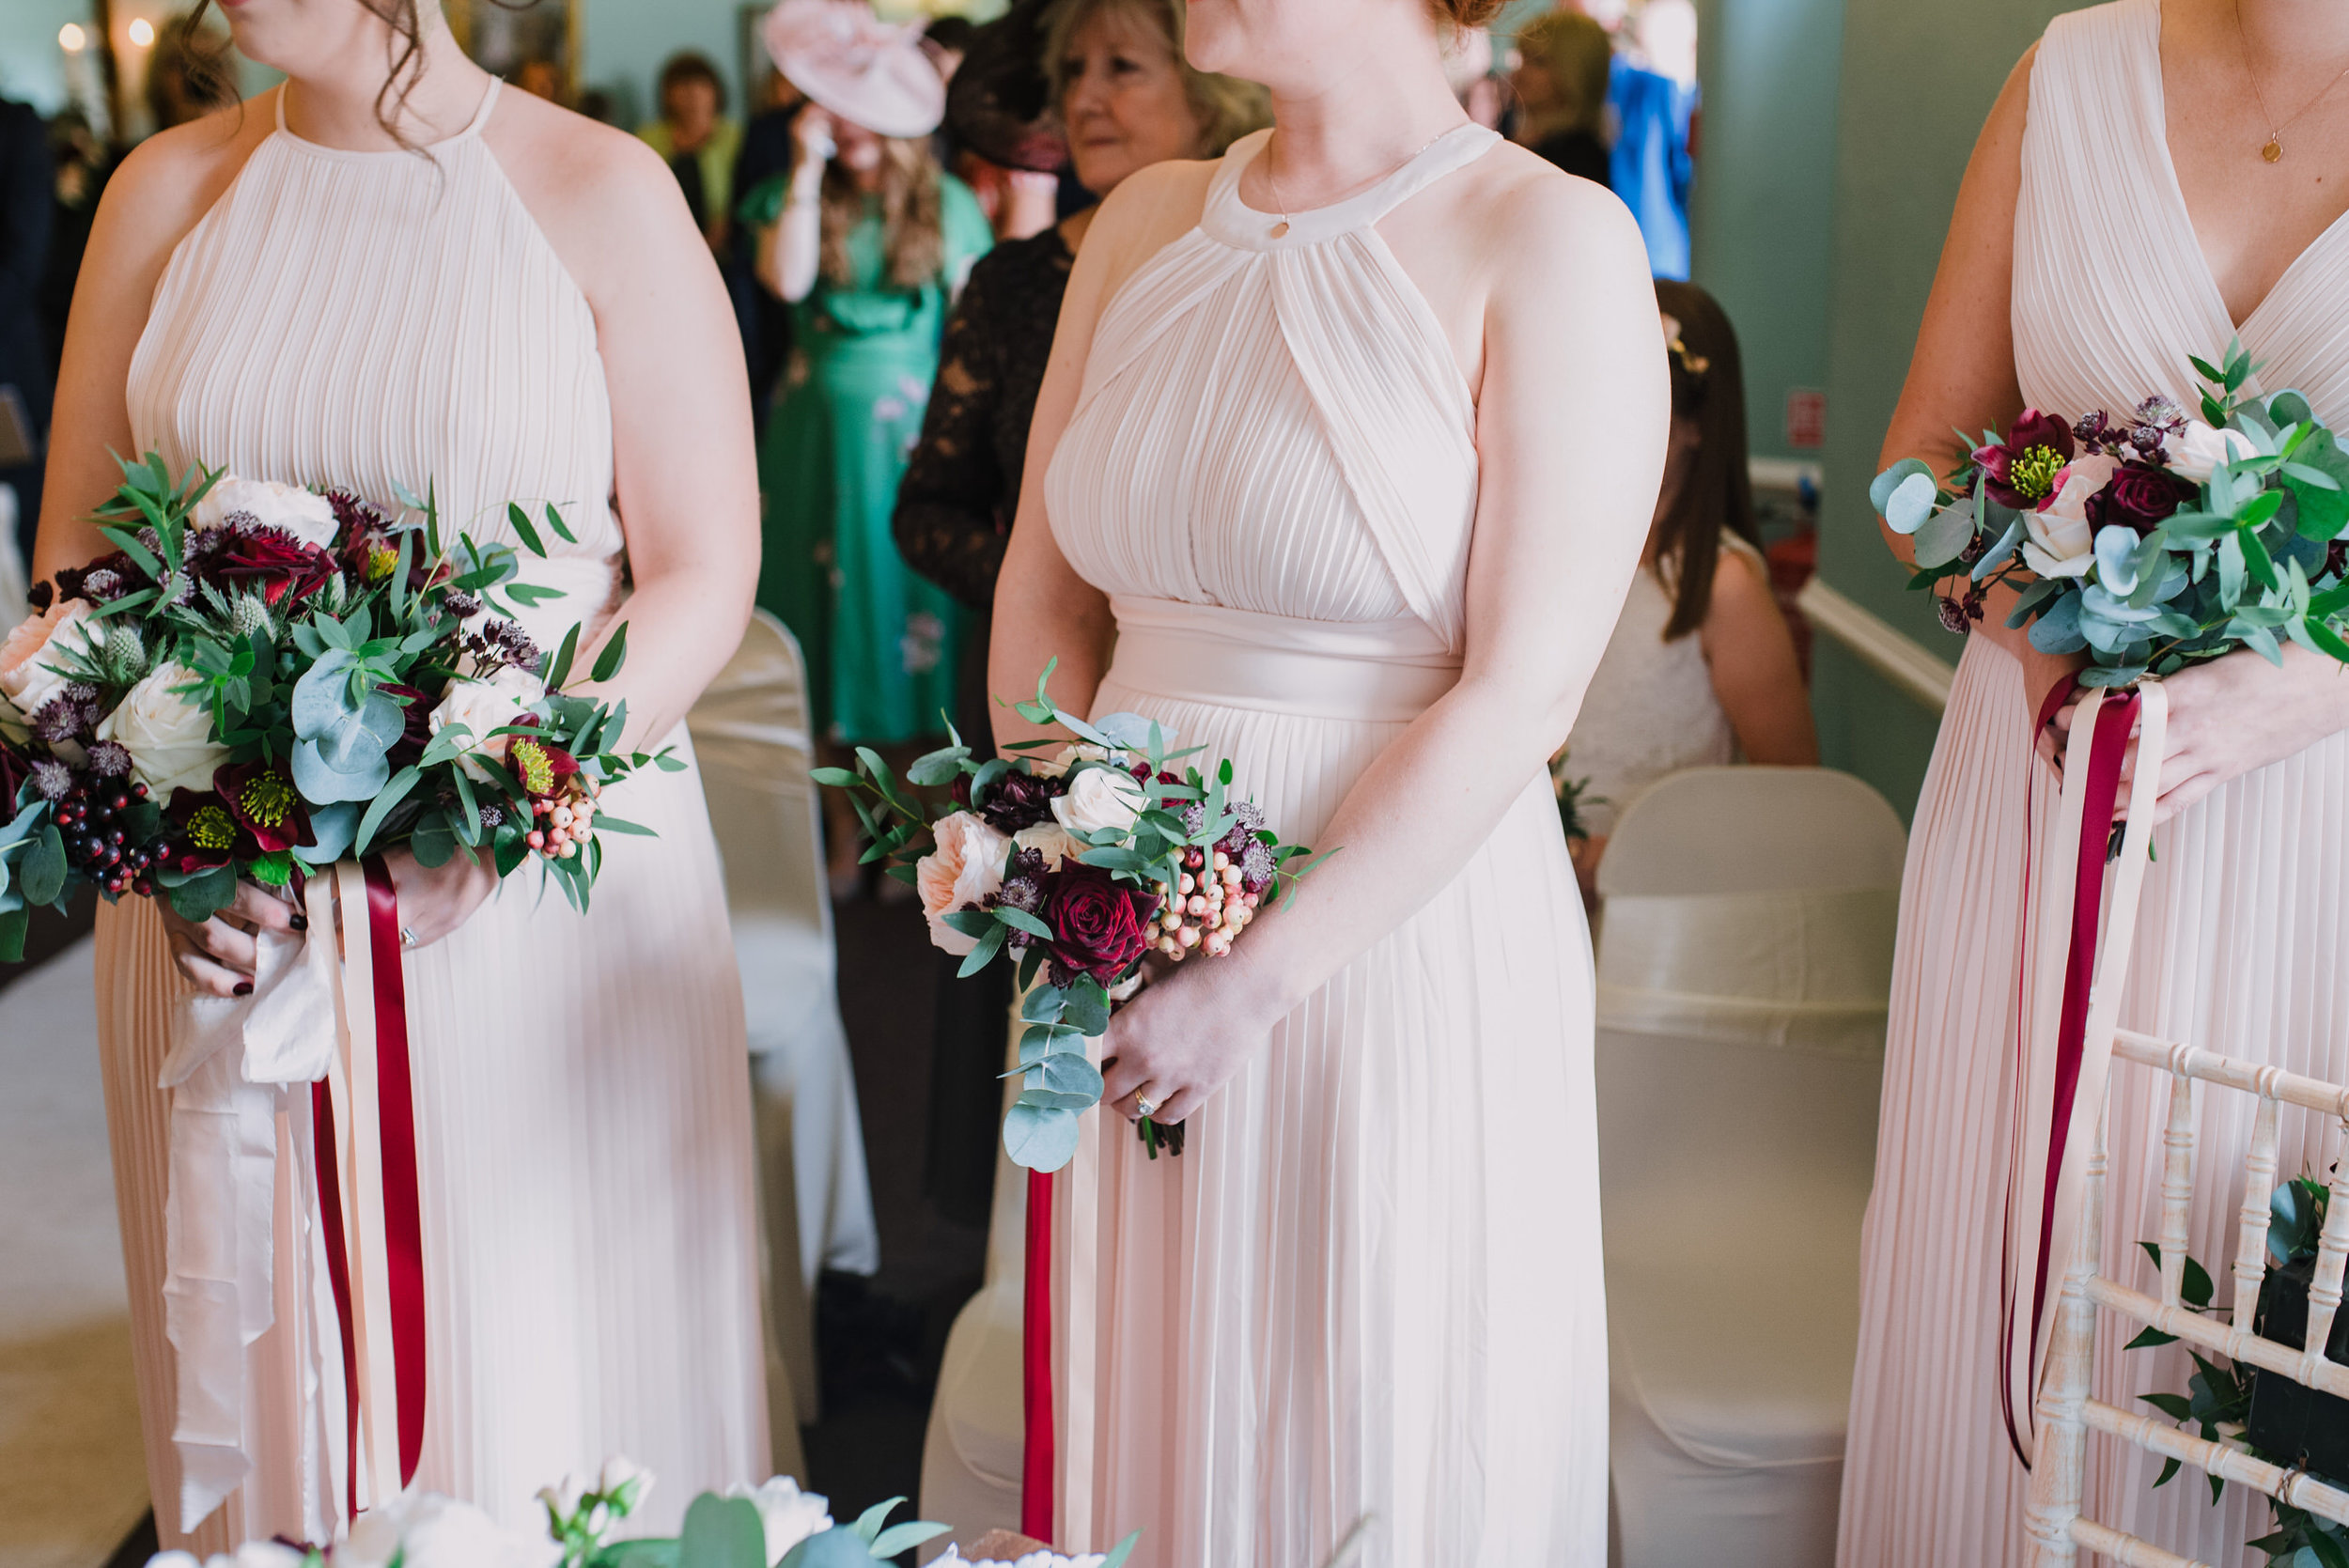 lissanoure castle wedding, northern ireland wedding photographer, romantic northern irish wedding venue, castle wedding ireland, natural wedding photography ni (50).jpg